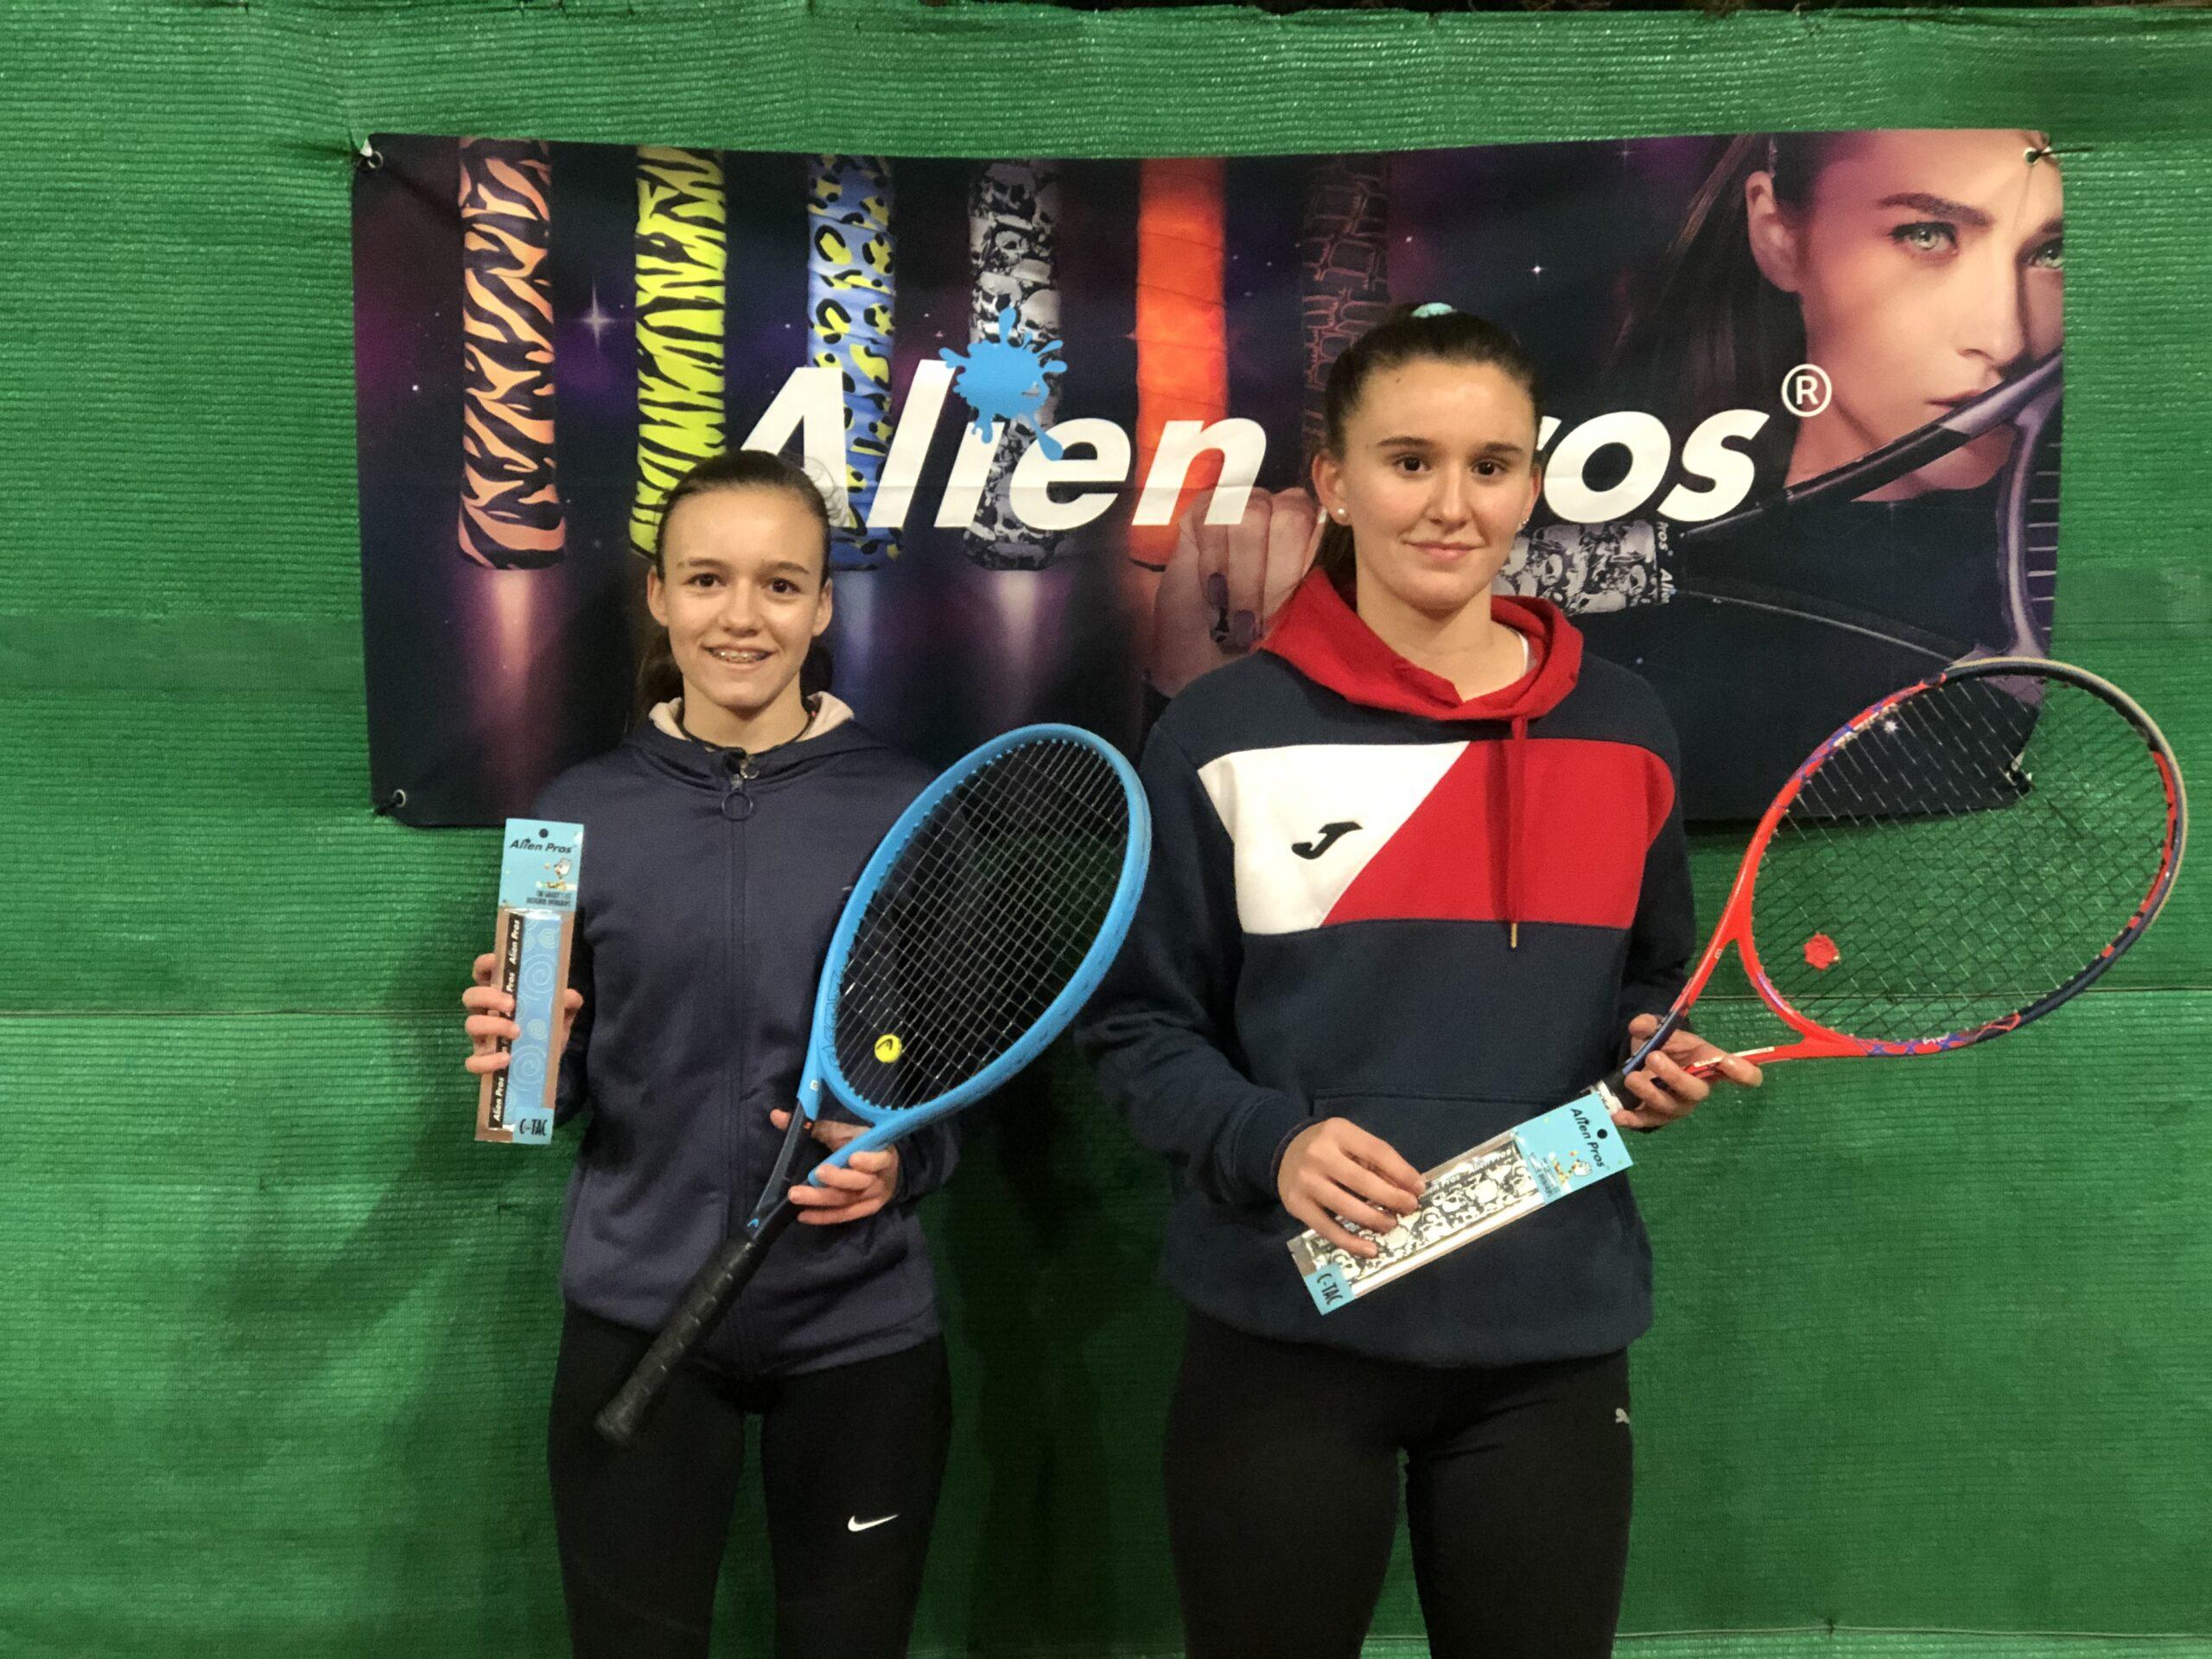 MBA-Tennis-Academy-Alien Pros Alumnos (11)